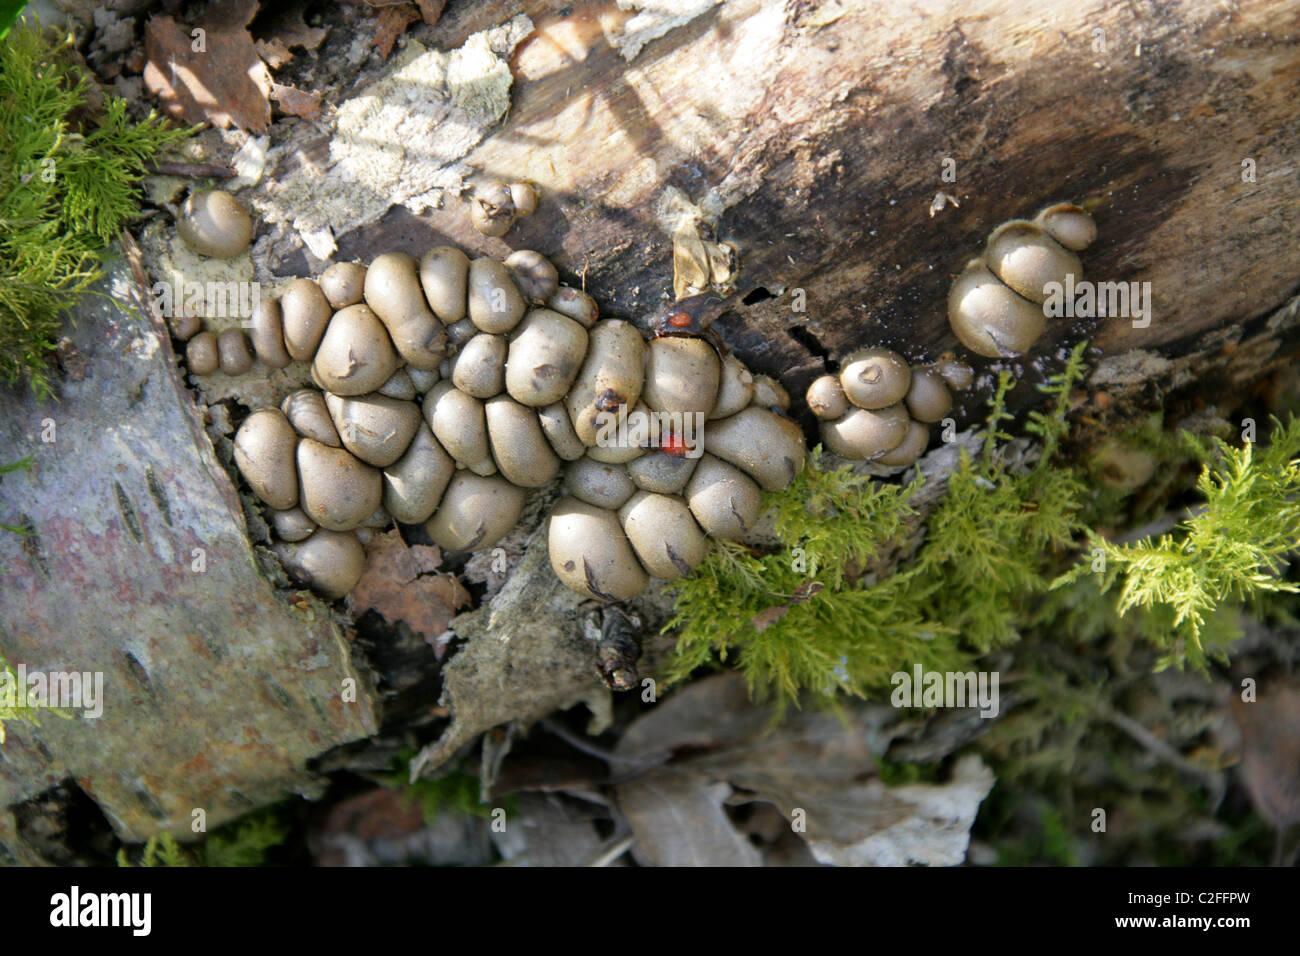 Birch Tree Fungi. - Stock Image